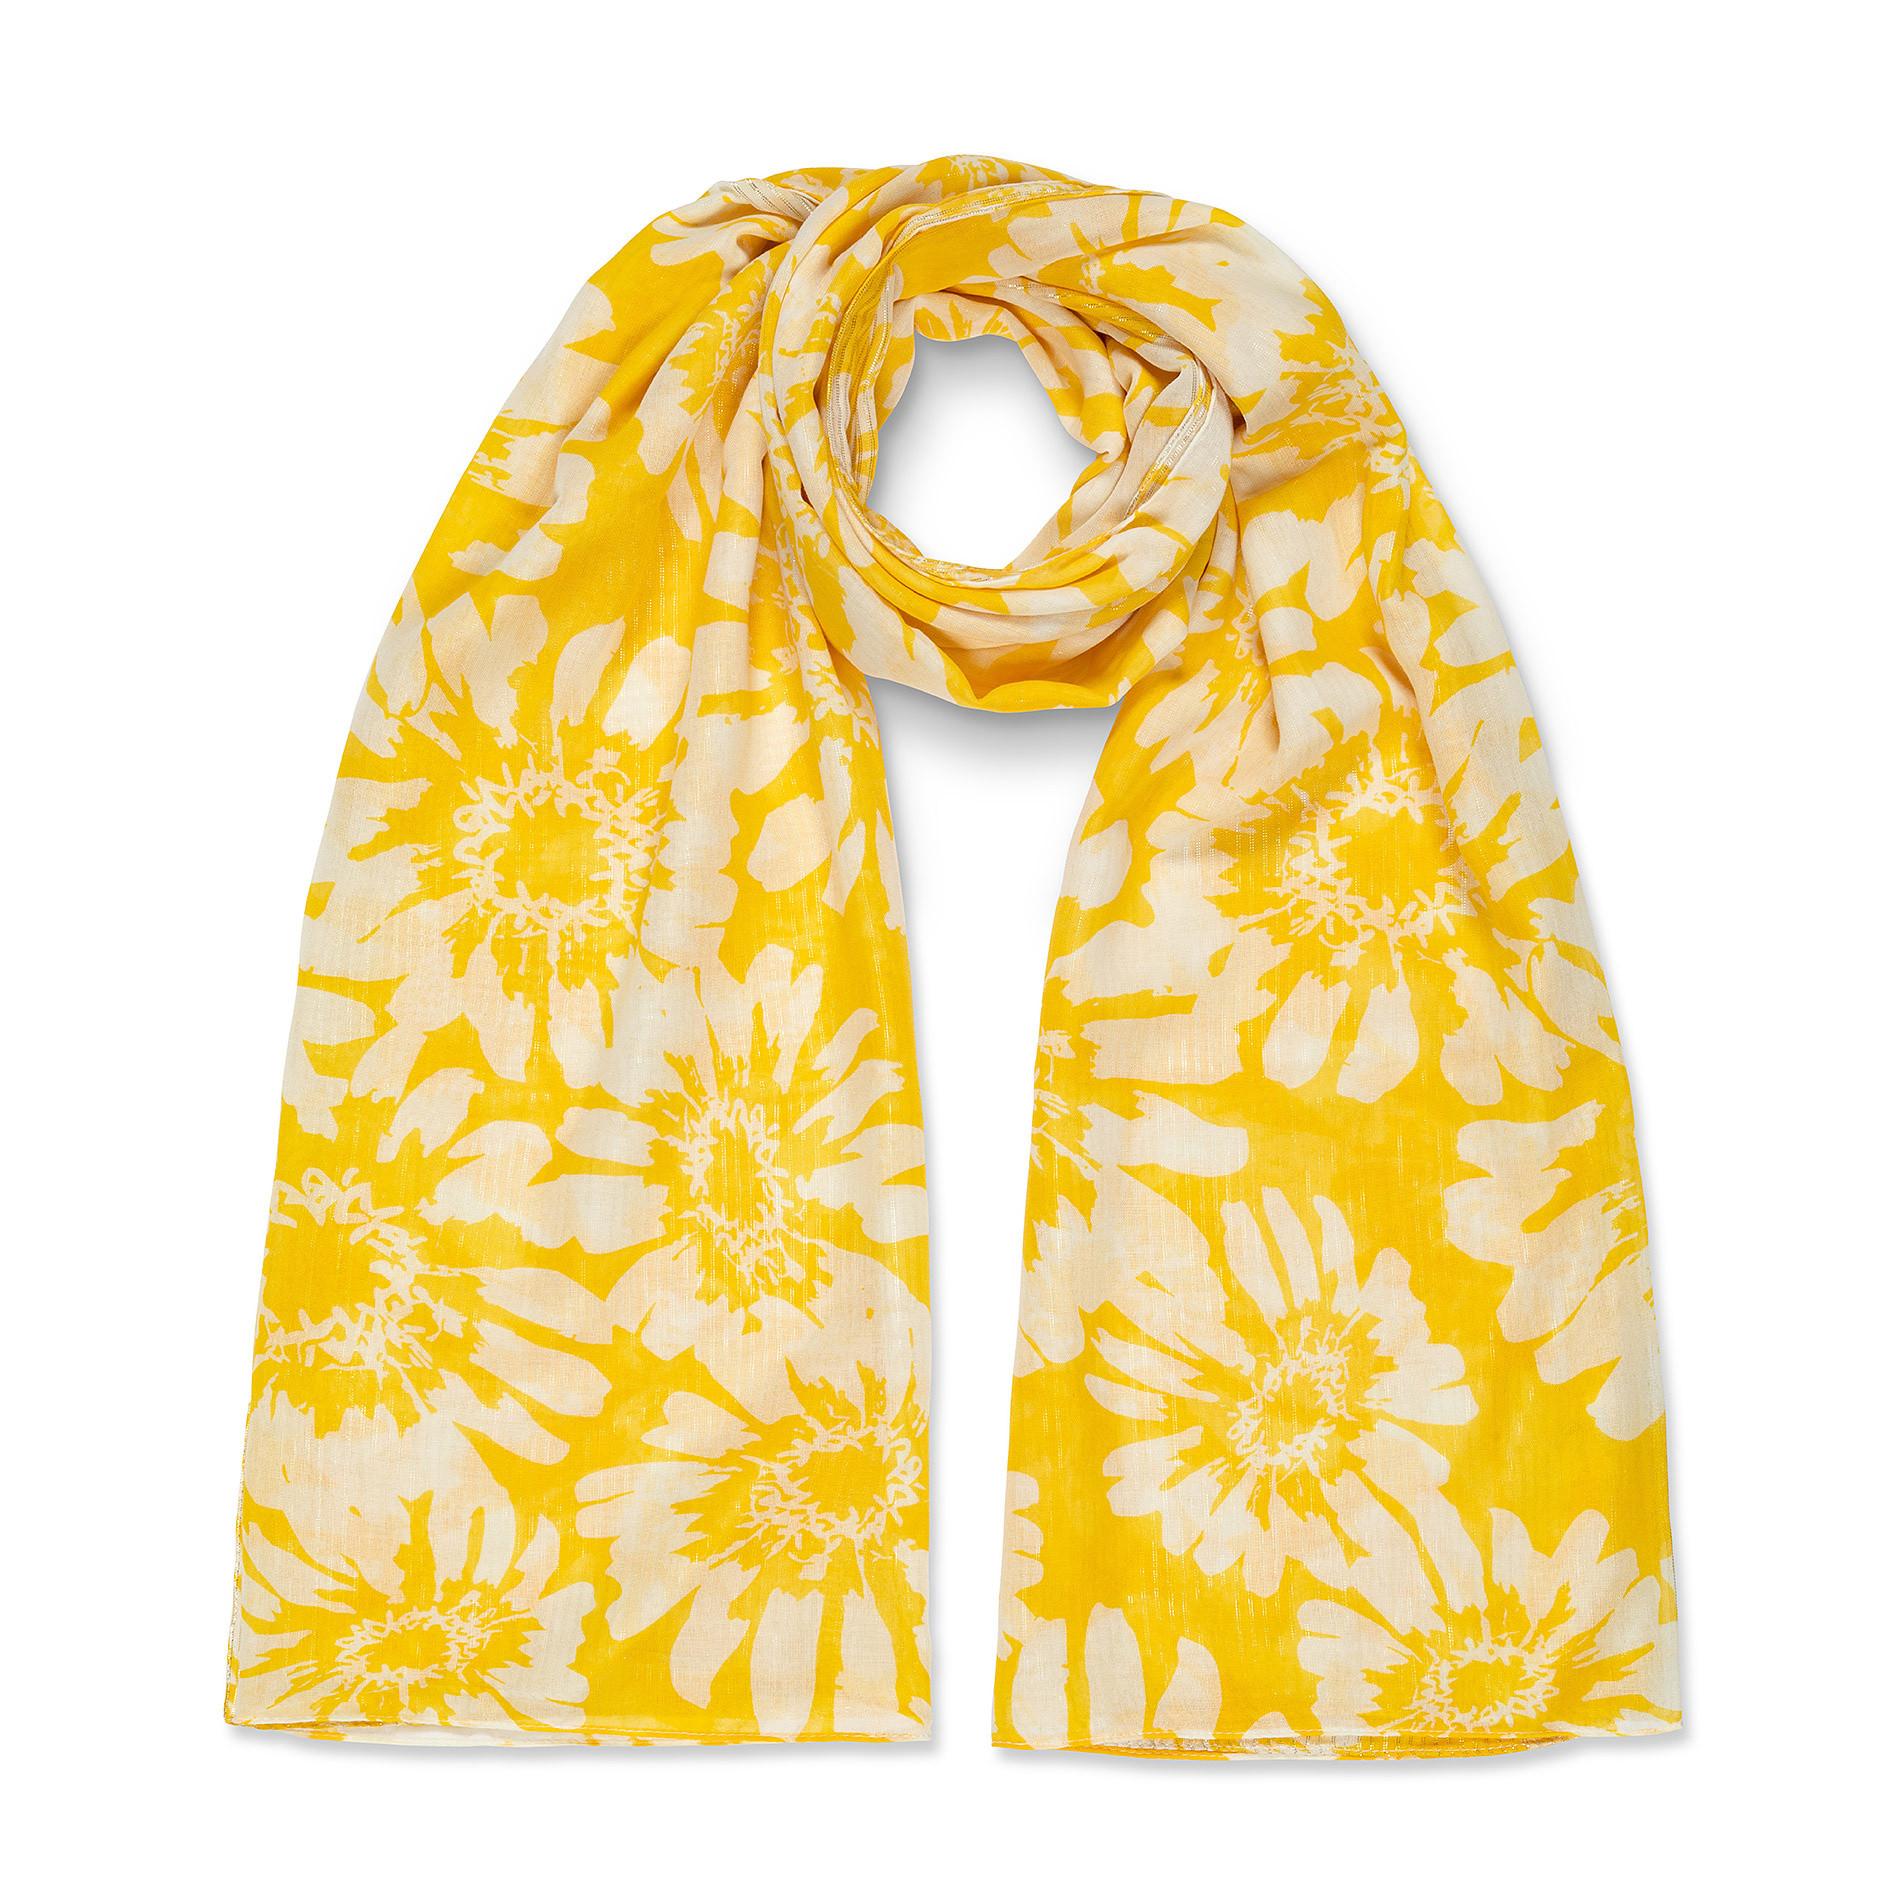 Sciarpa stampa fiori e lurex Koan, Giallo, large image number 0